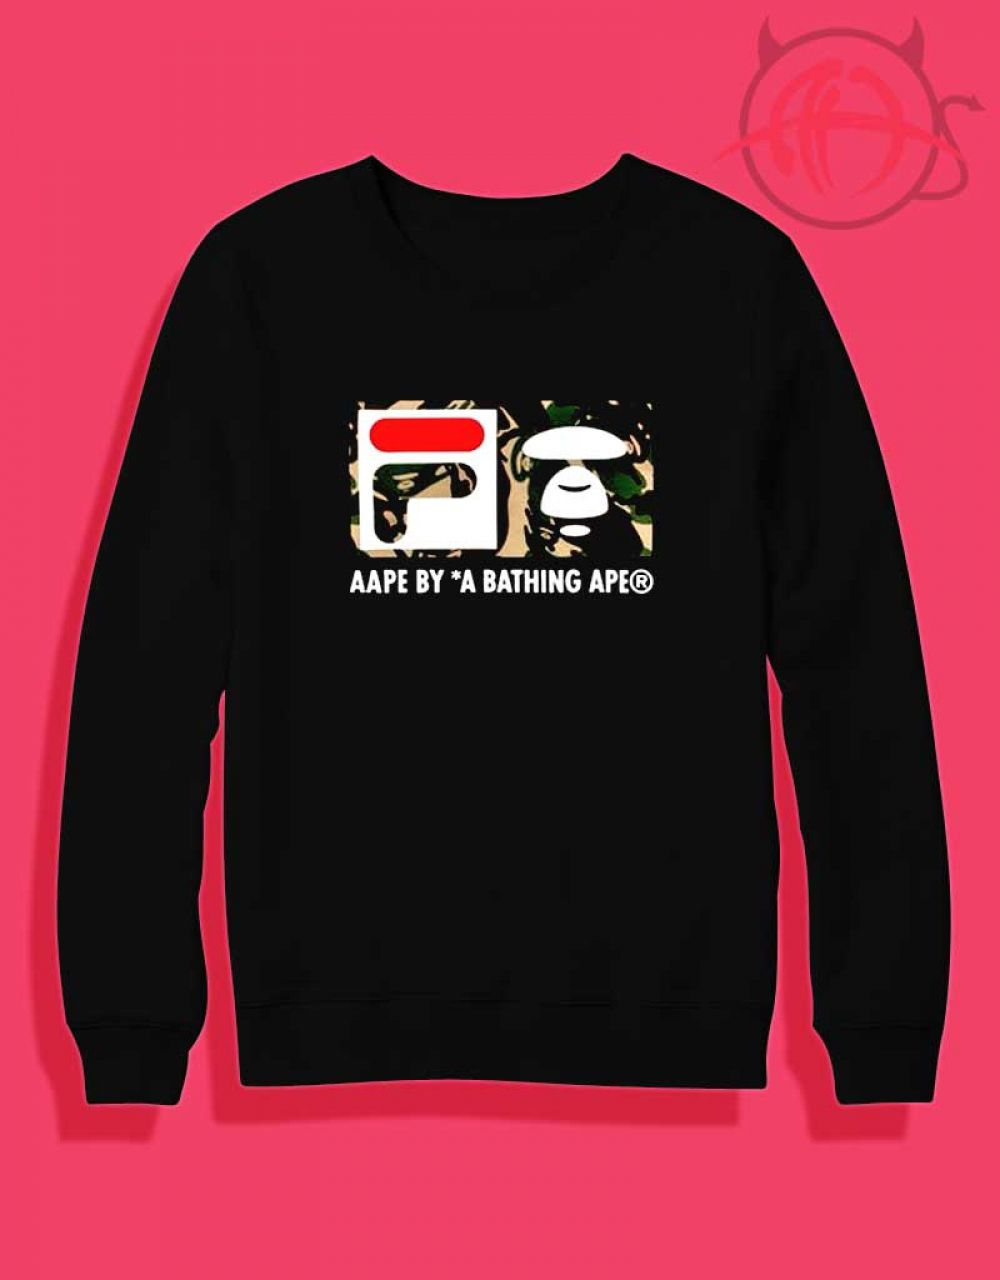 6749398eb18d Fila Collab Bape Camo Design Sweatshirt $ 27.50 #Tee #Hype #Outfits #Outfit  #Hypebeast #fashion #shirt #Tees #Tops #Teen